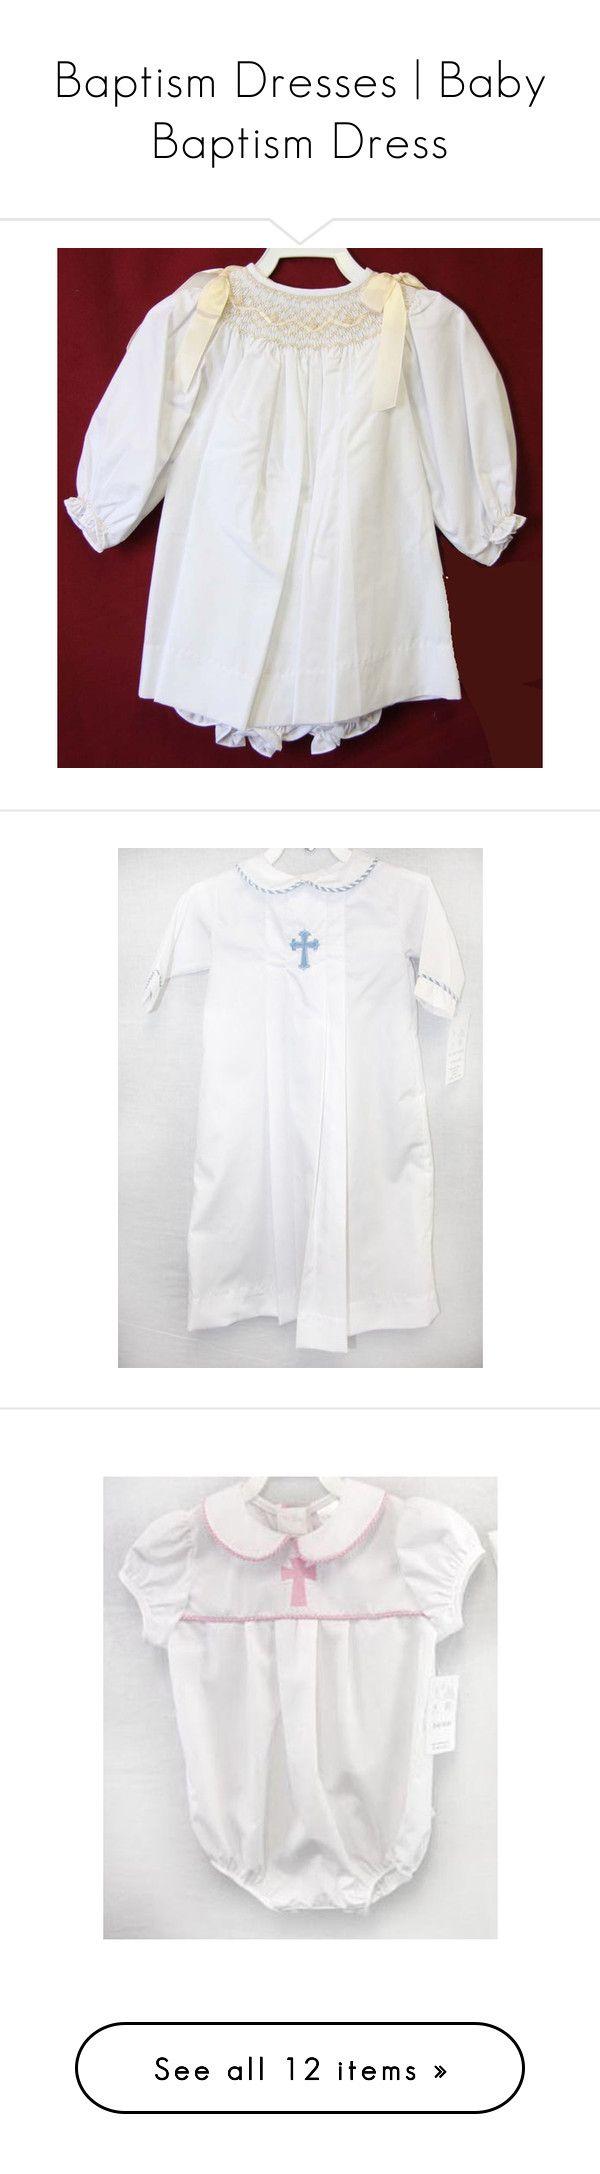 Baptism Dresses | Baby Baptism Dress by bellfas on Polyvore